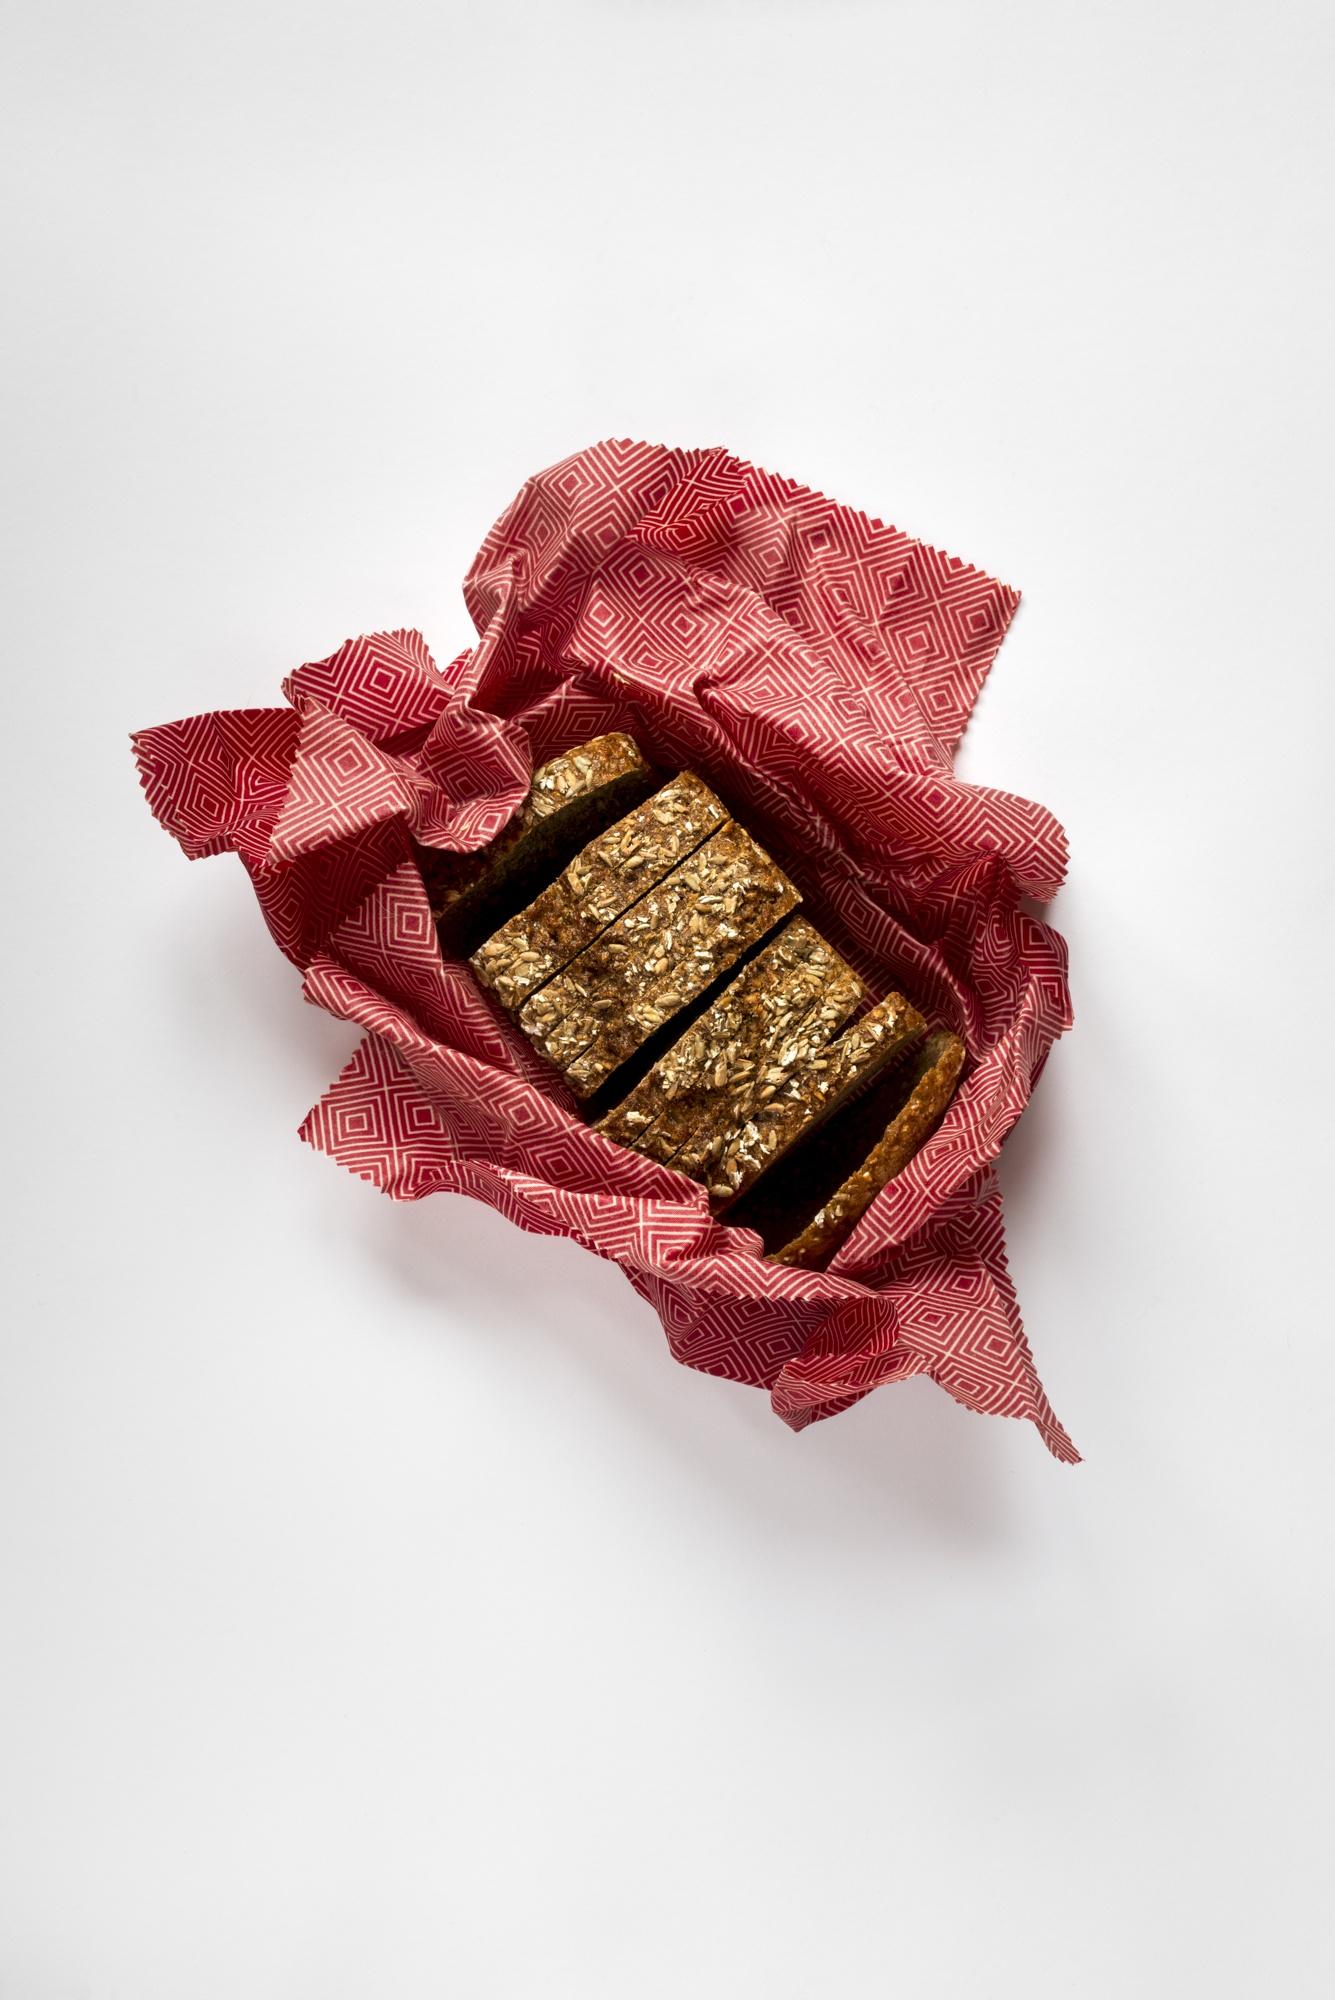 Brot im roten Bienenwachstuch verpackt